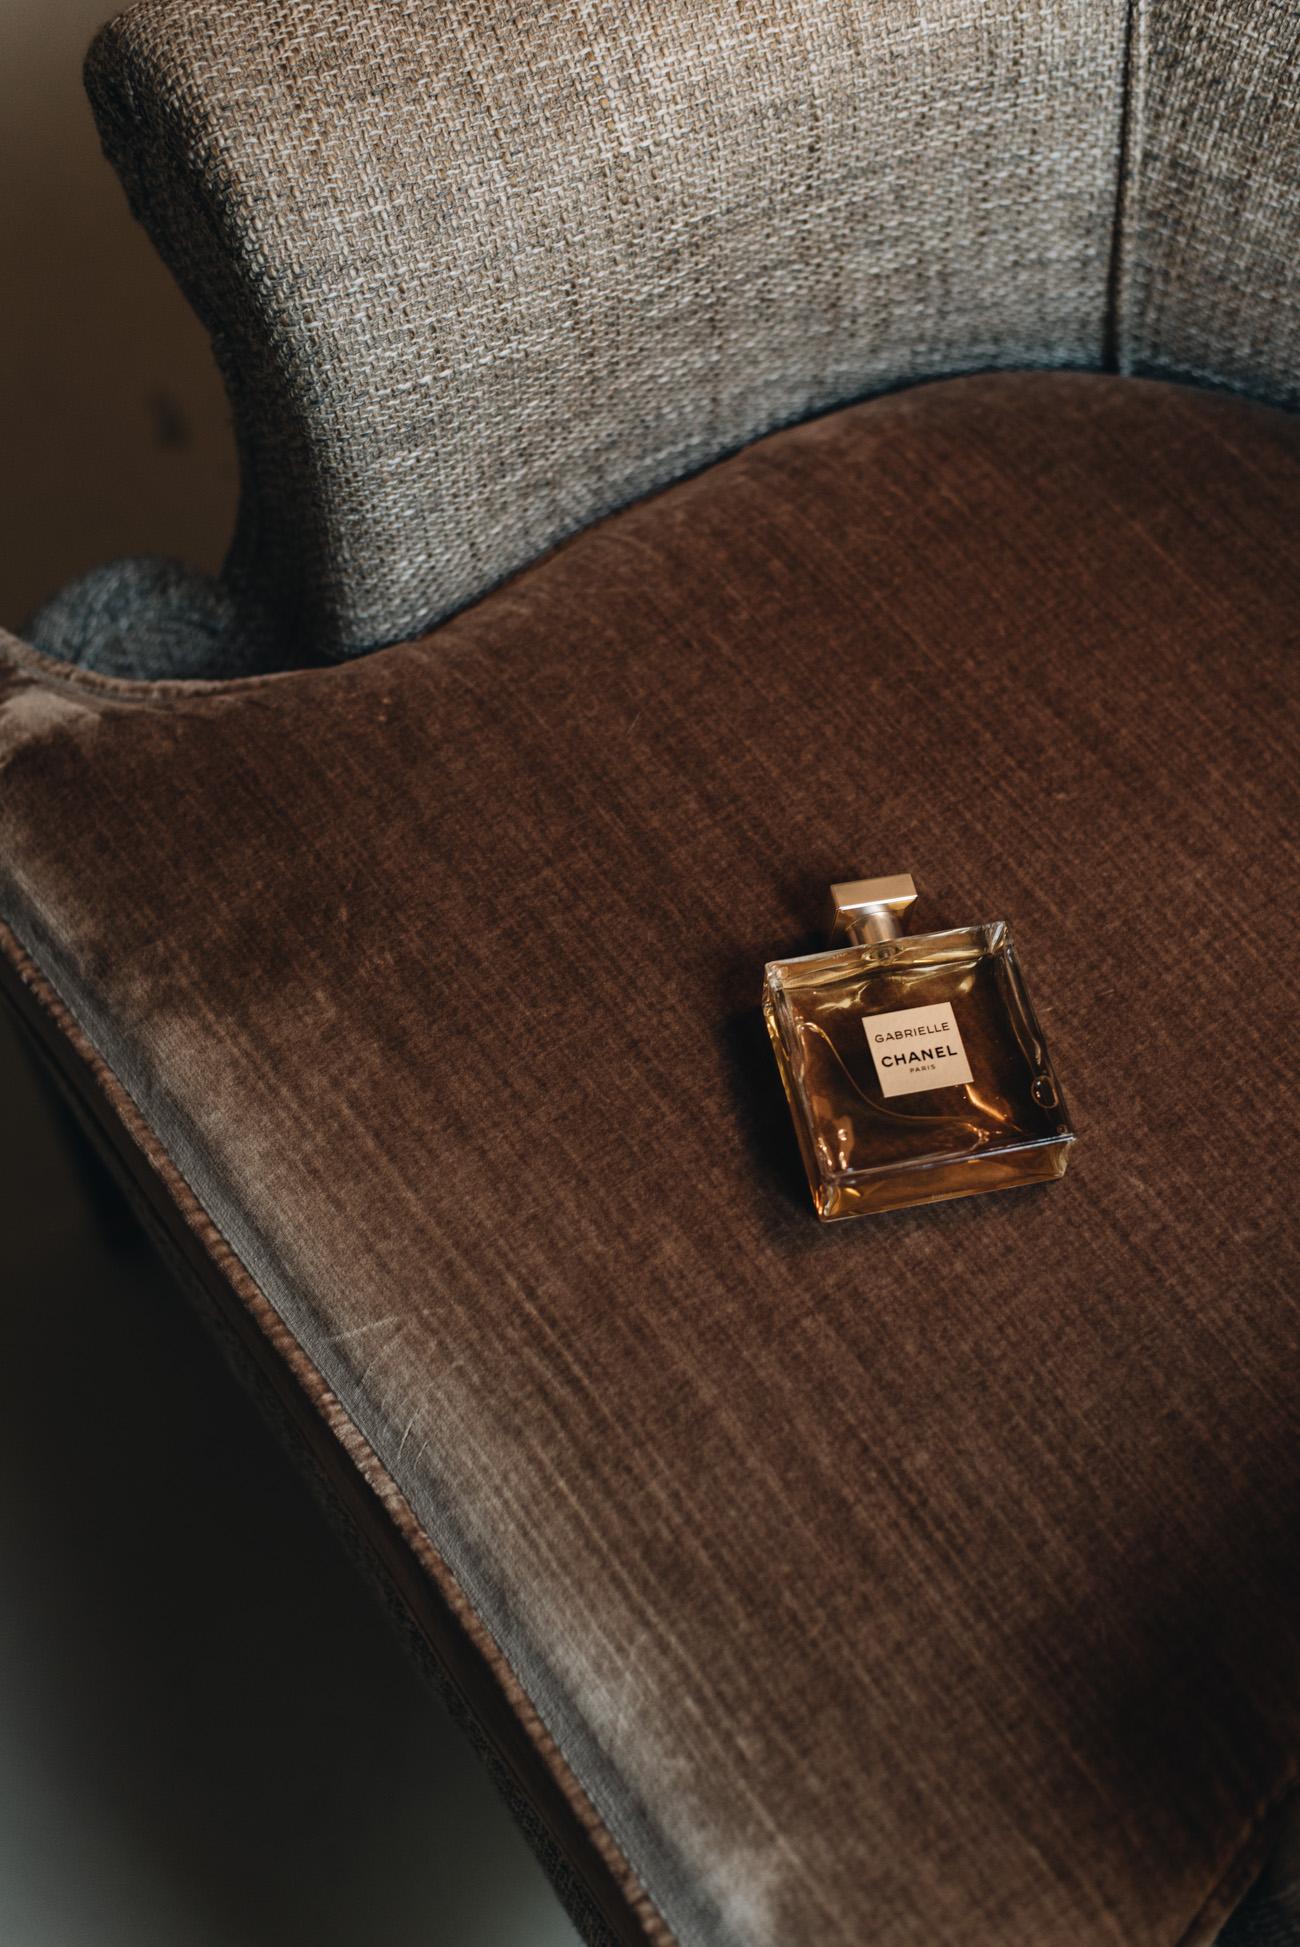 Gabrielle-Chanel-Duft-2017-parfum-launch-neuheiten-beauty-trends-nina-schwichtenberg-fashiioncarpet